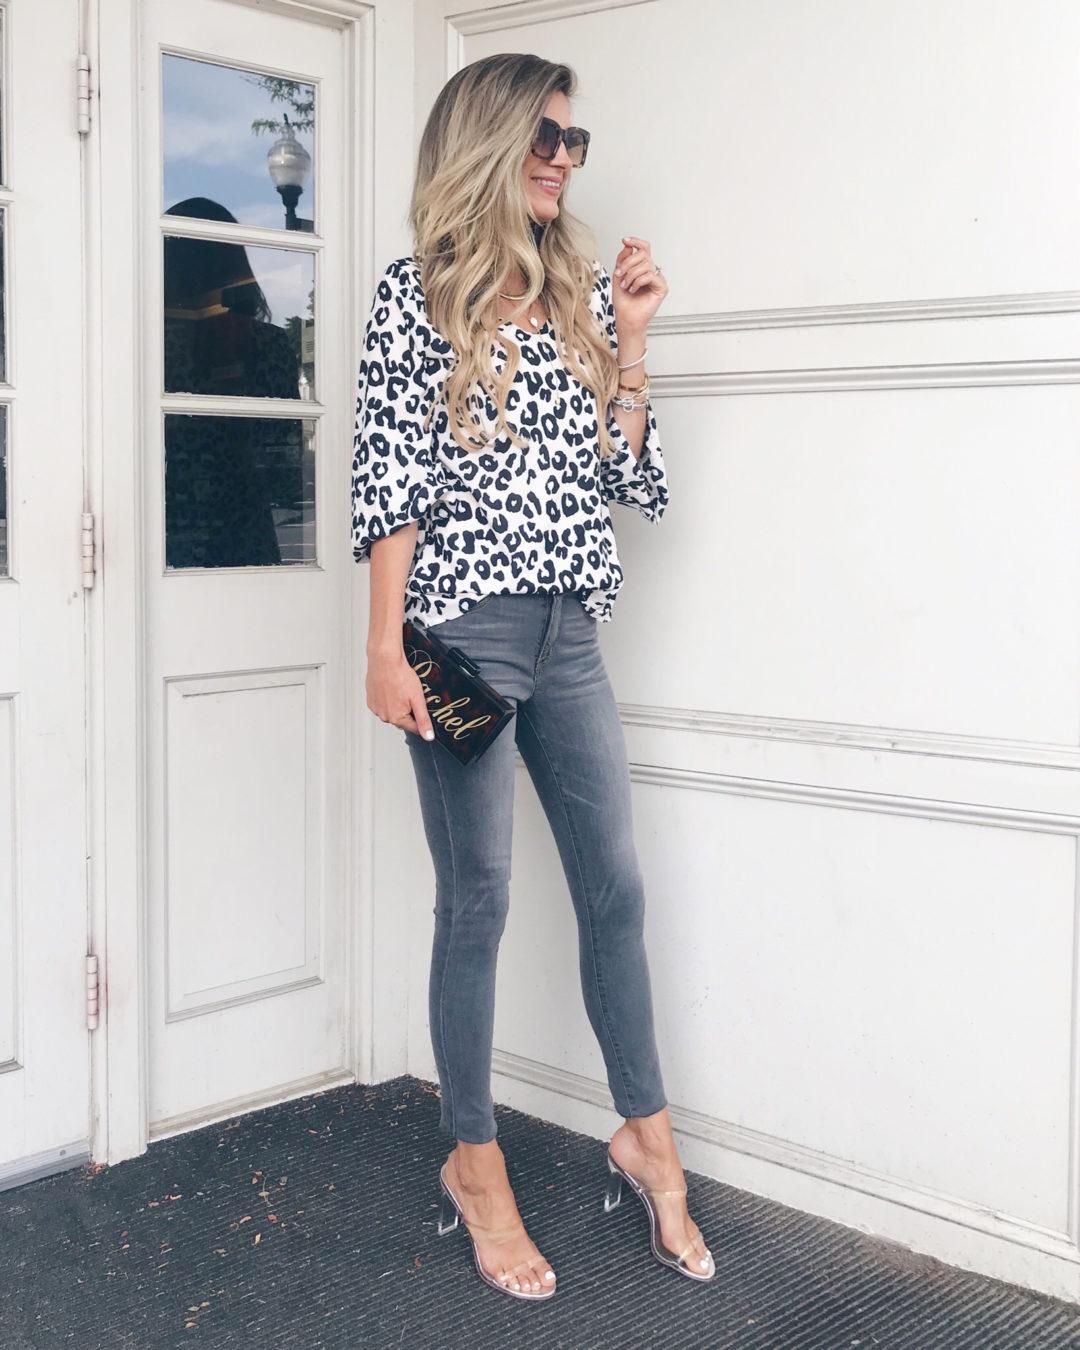 spring shoe trends 2020 - clear heels on pinteresting plans fashion blog